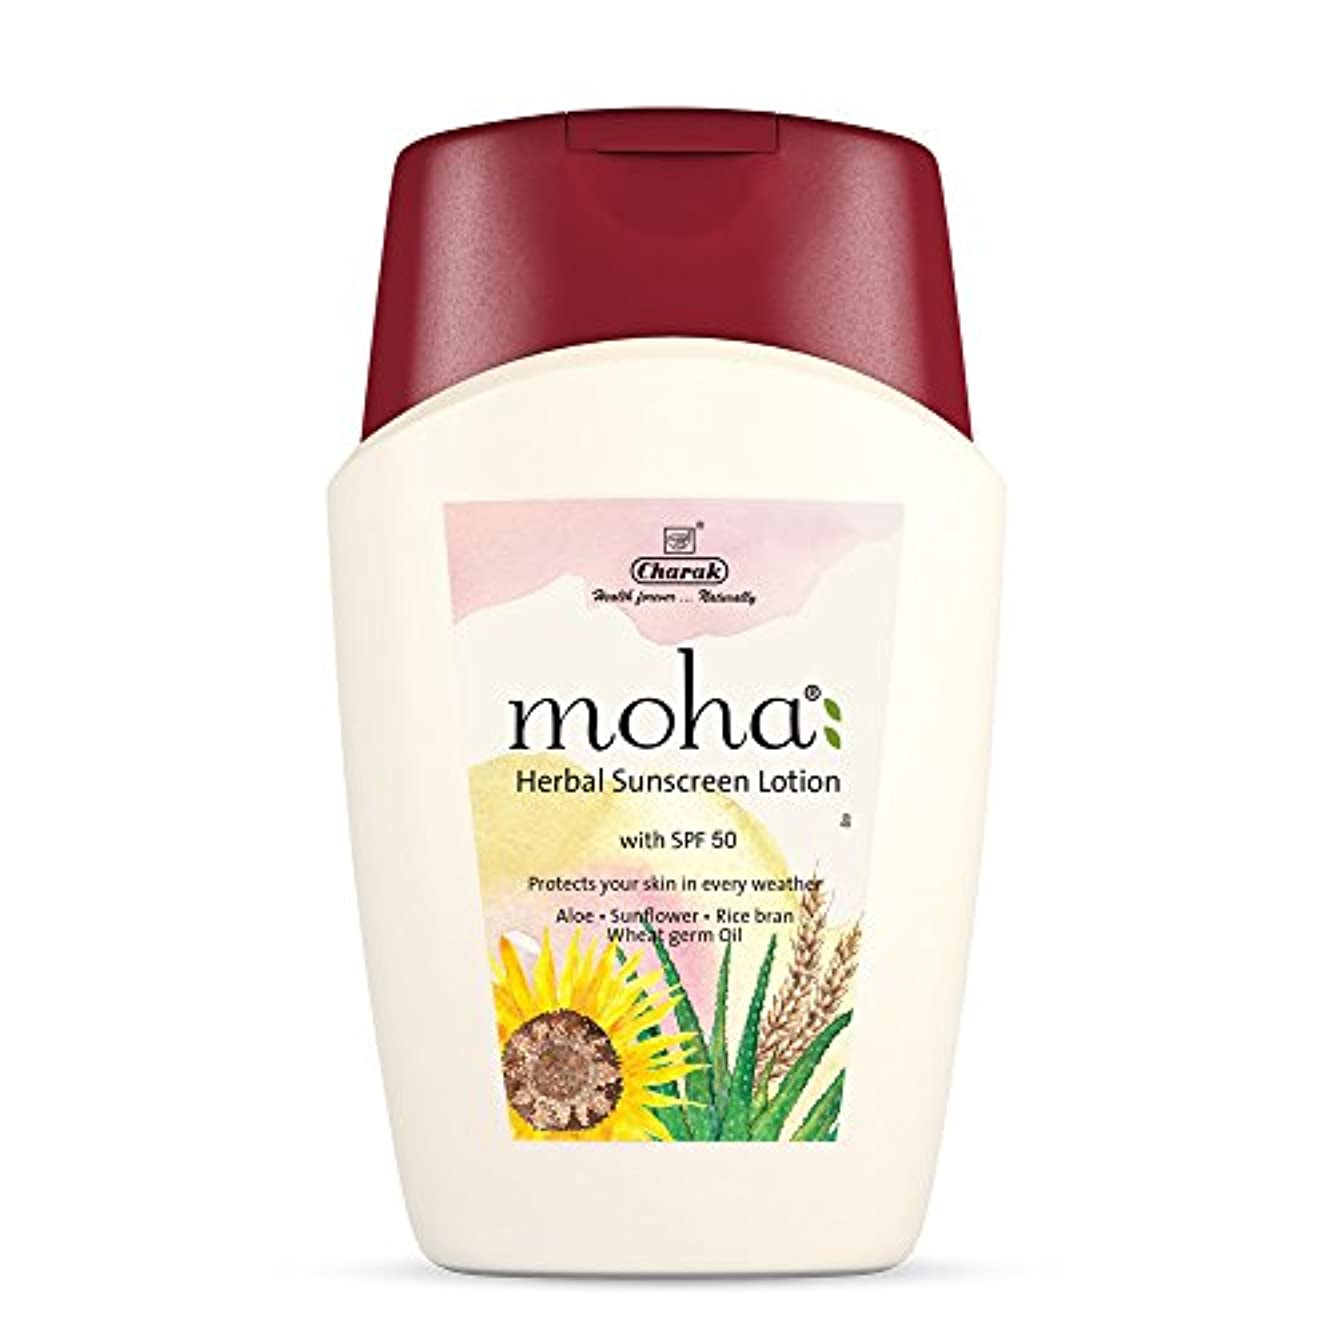 Charak Pharma Moha Herbal Sunscreen Lotion with SPF 50 (100 ml)